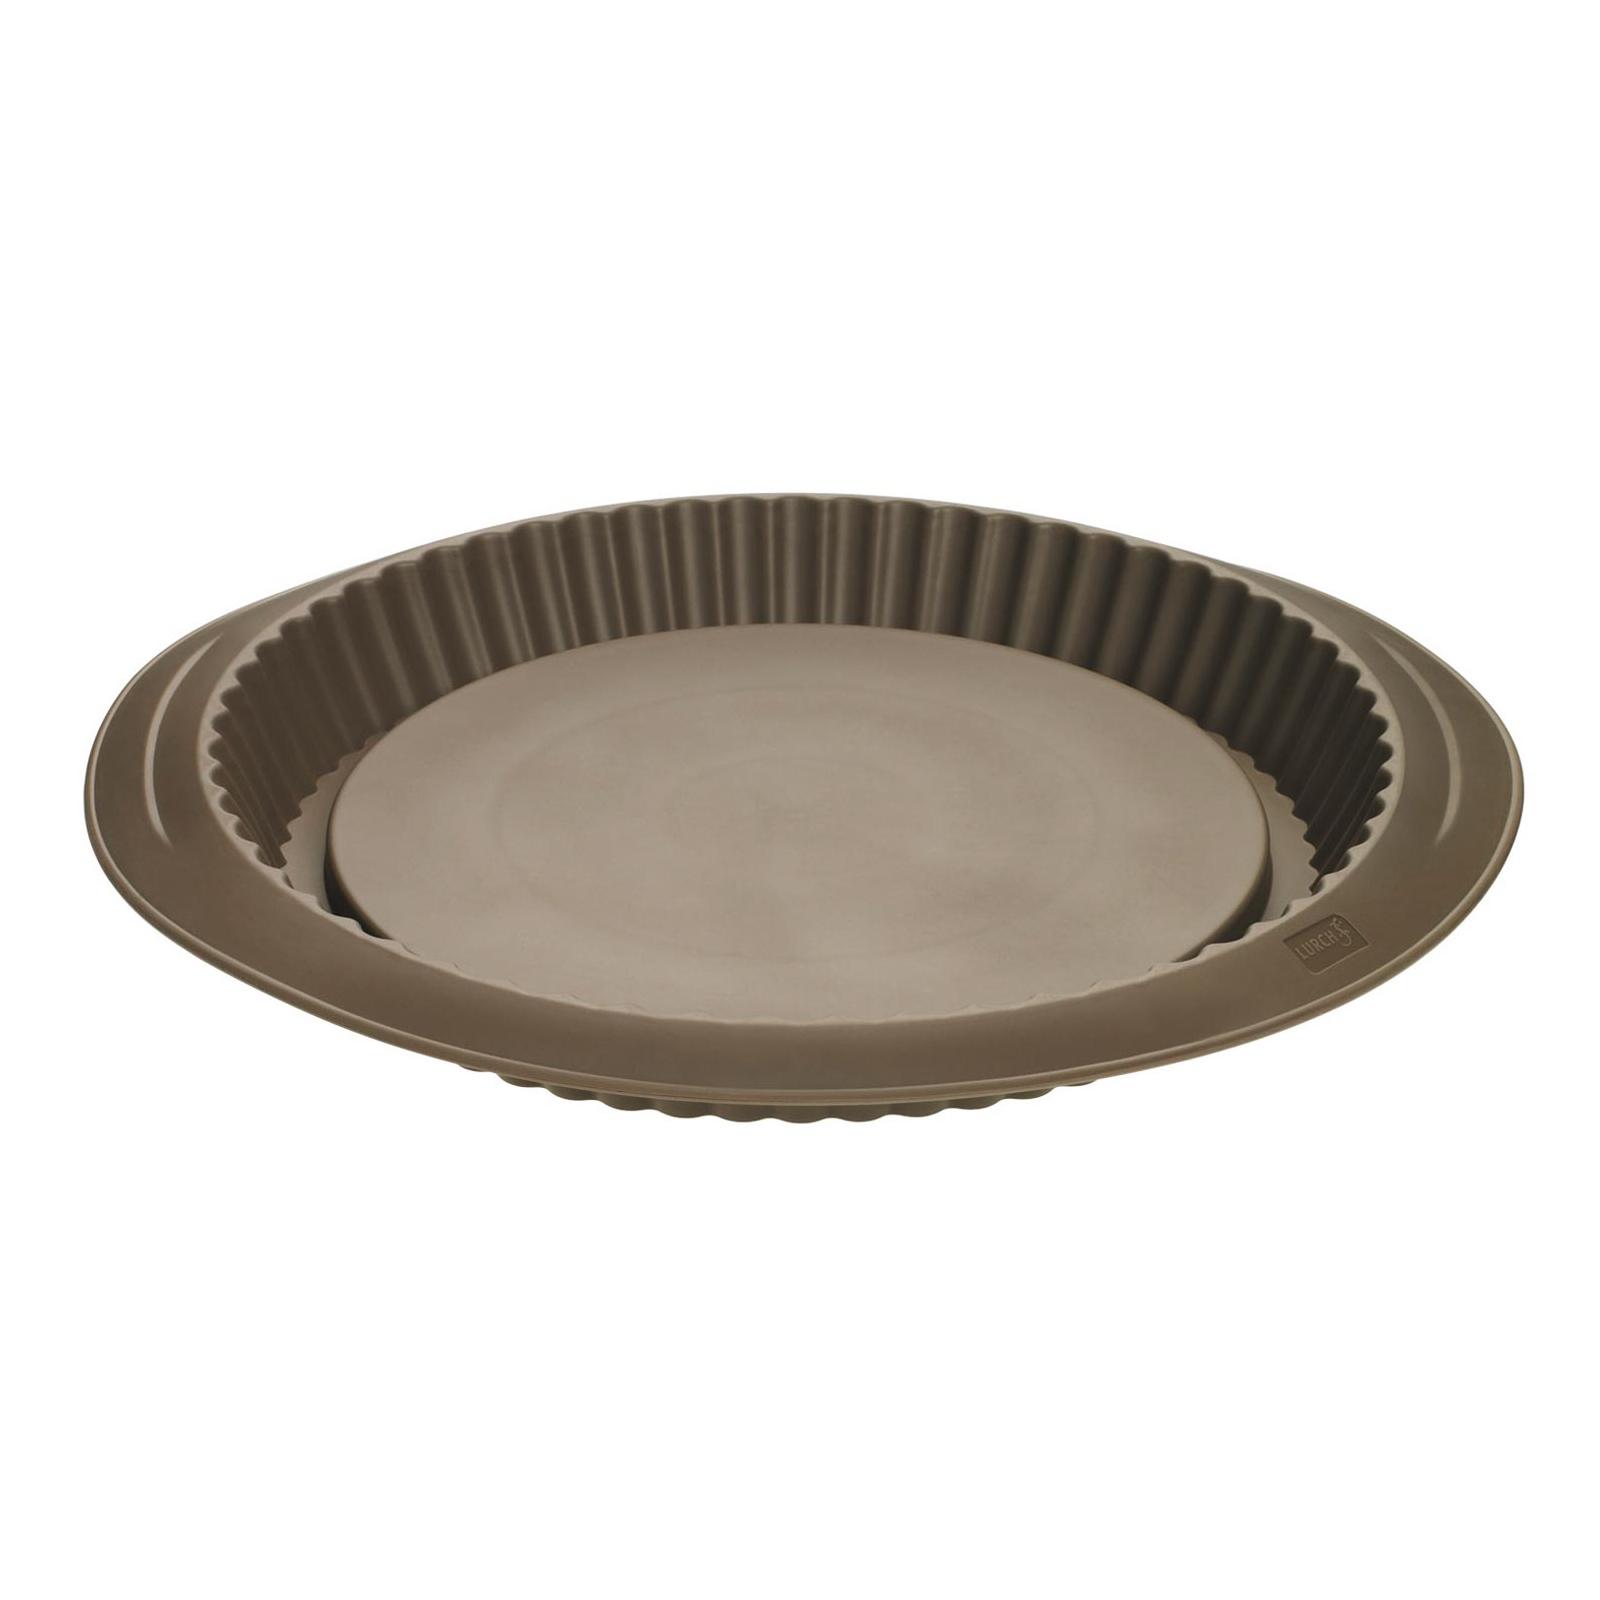 Obstboden 28 cm Backform Kuchenboden Flexiform Silikon braun